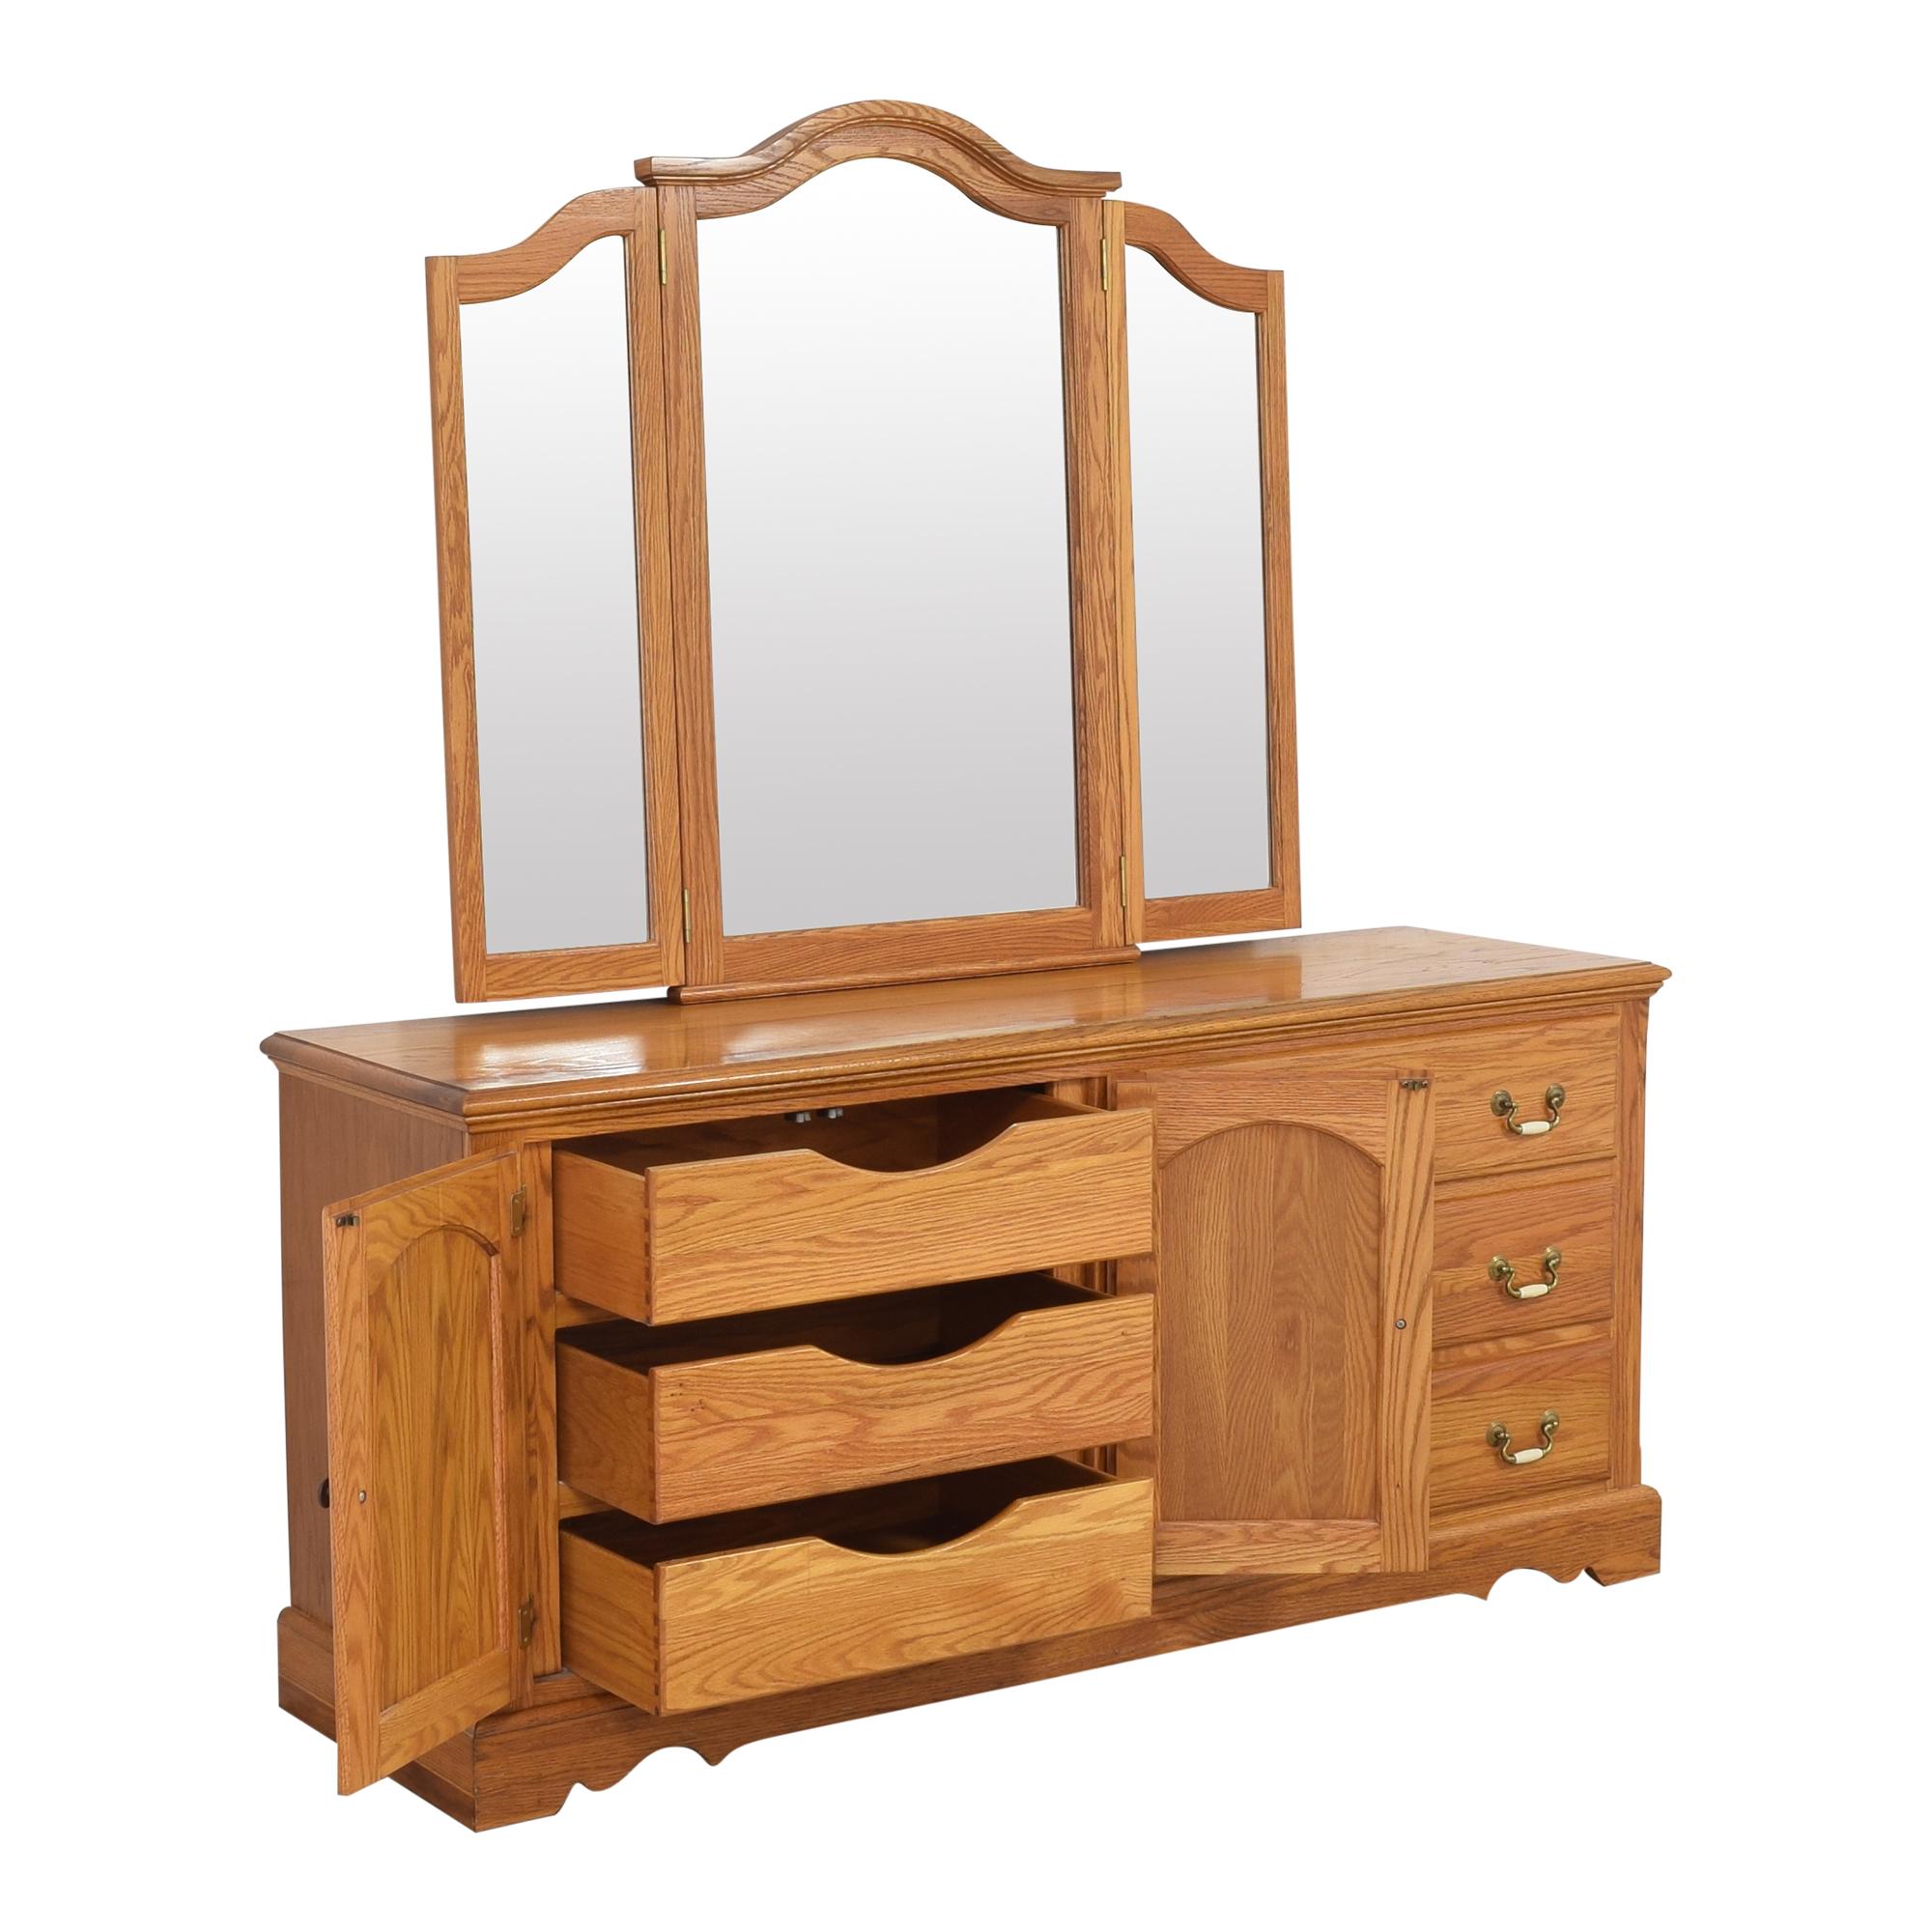 Nathan Hale Door Dresser and Triple Mirror / Dressers